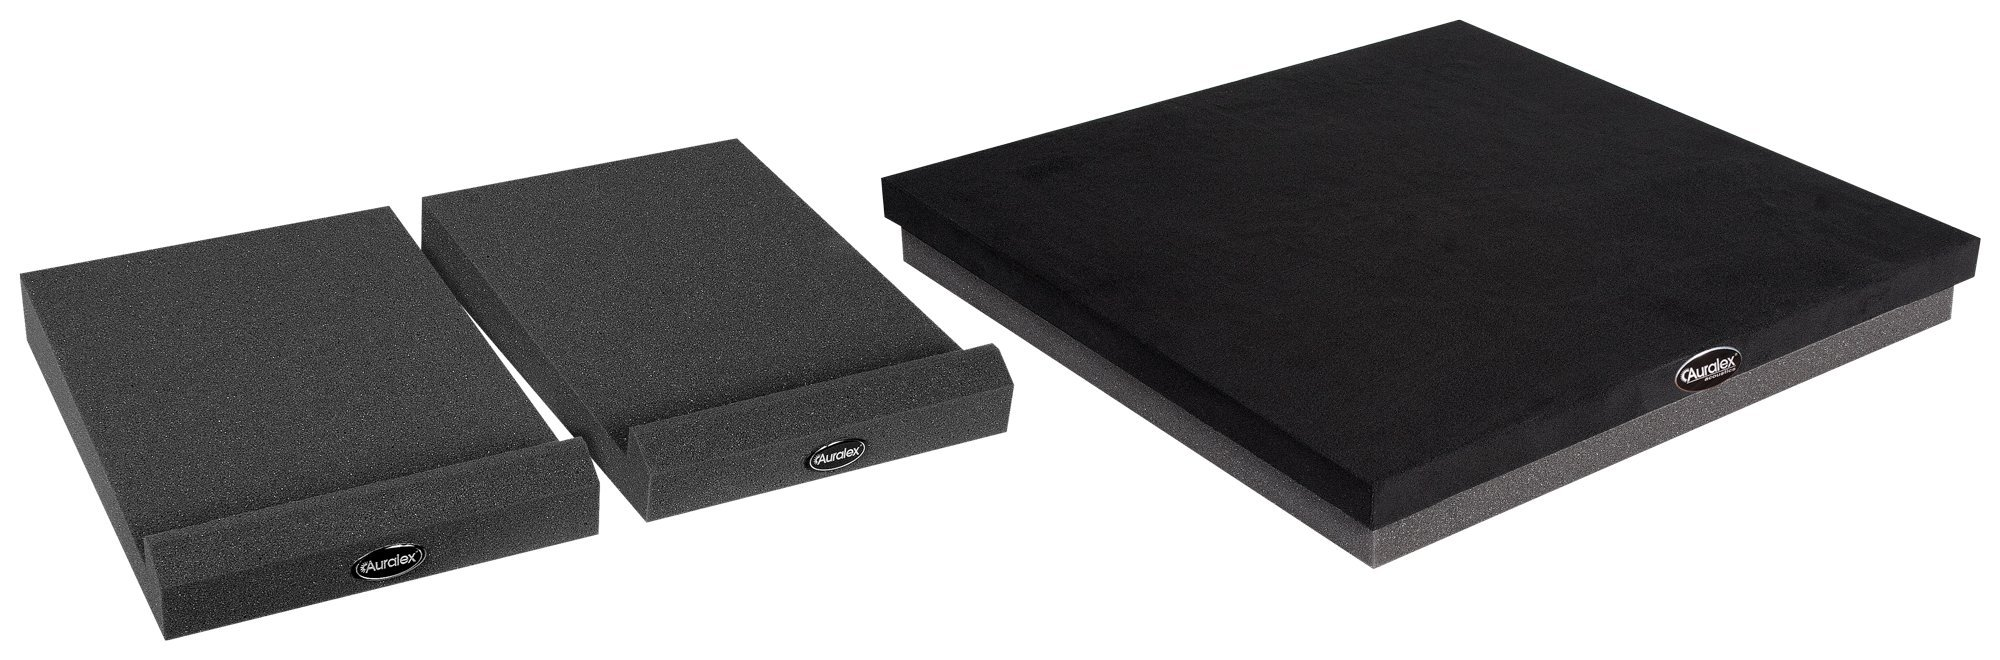 Auralex Acoustics SubDude-II MoPAD-XL Subwoofer and Loudspeaker Sound Isolation Set